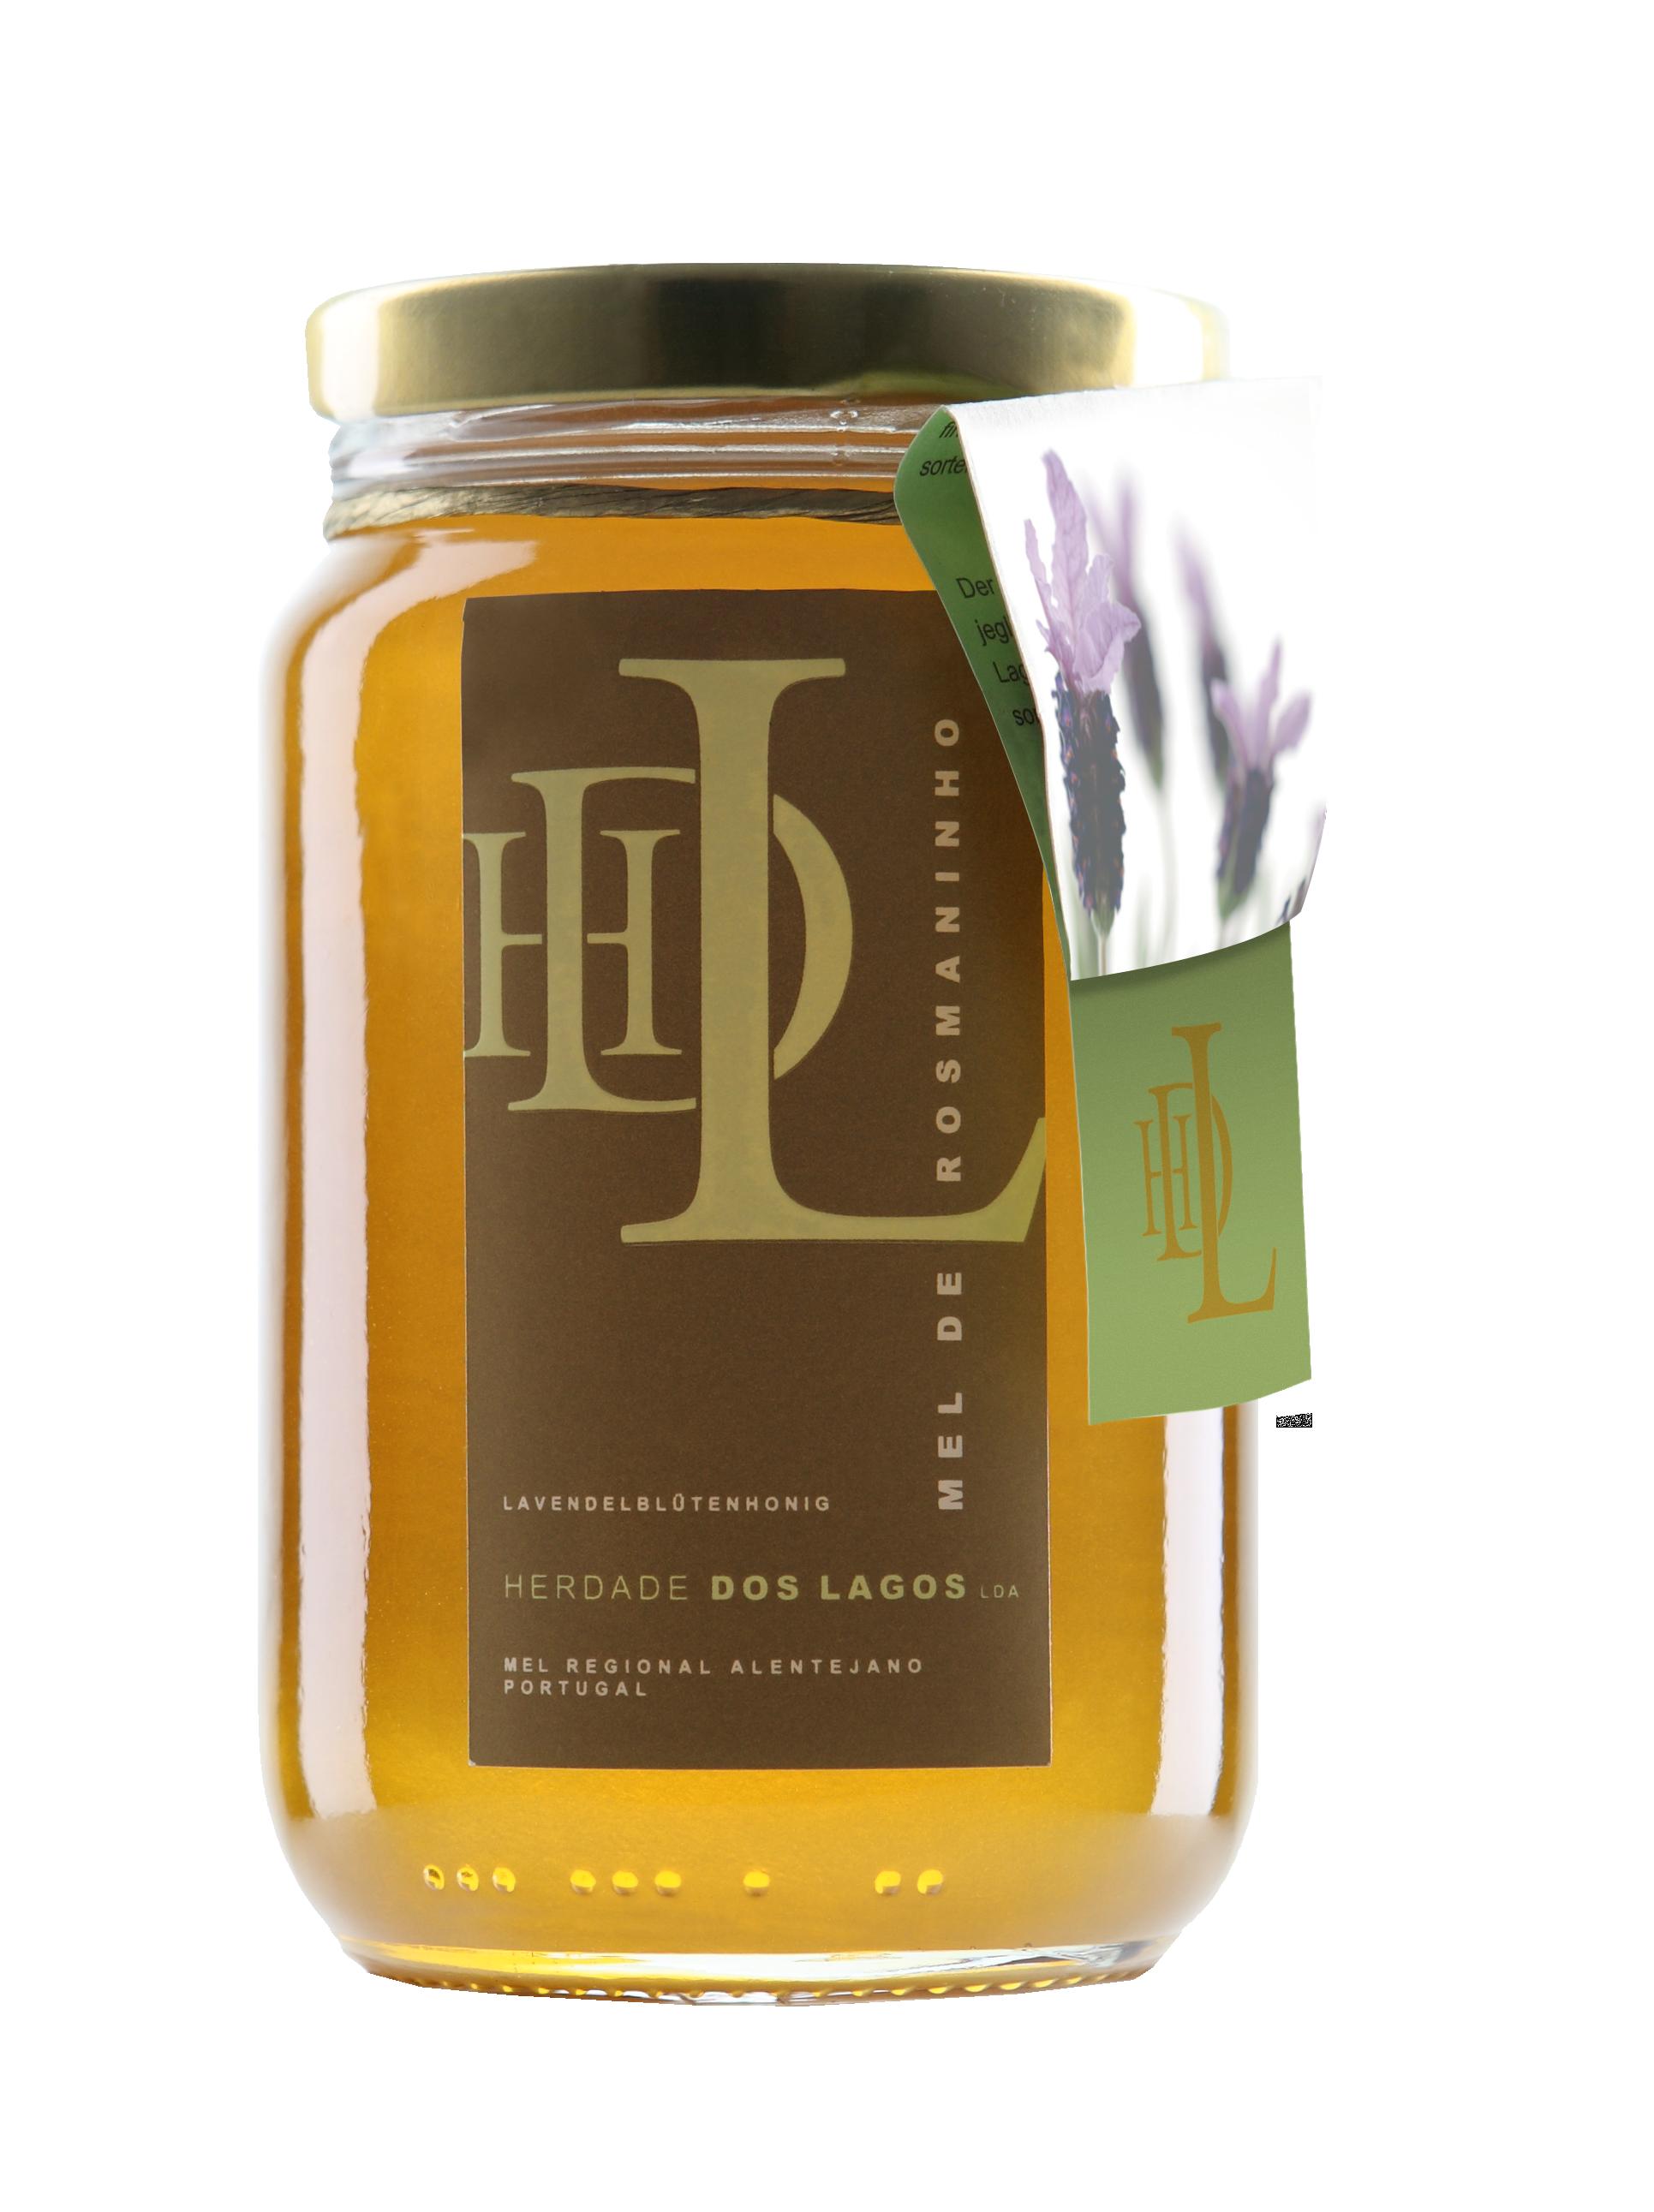 HDL Lavendelhonig